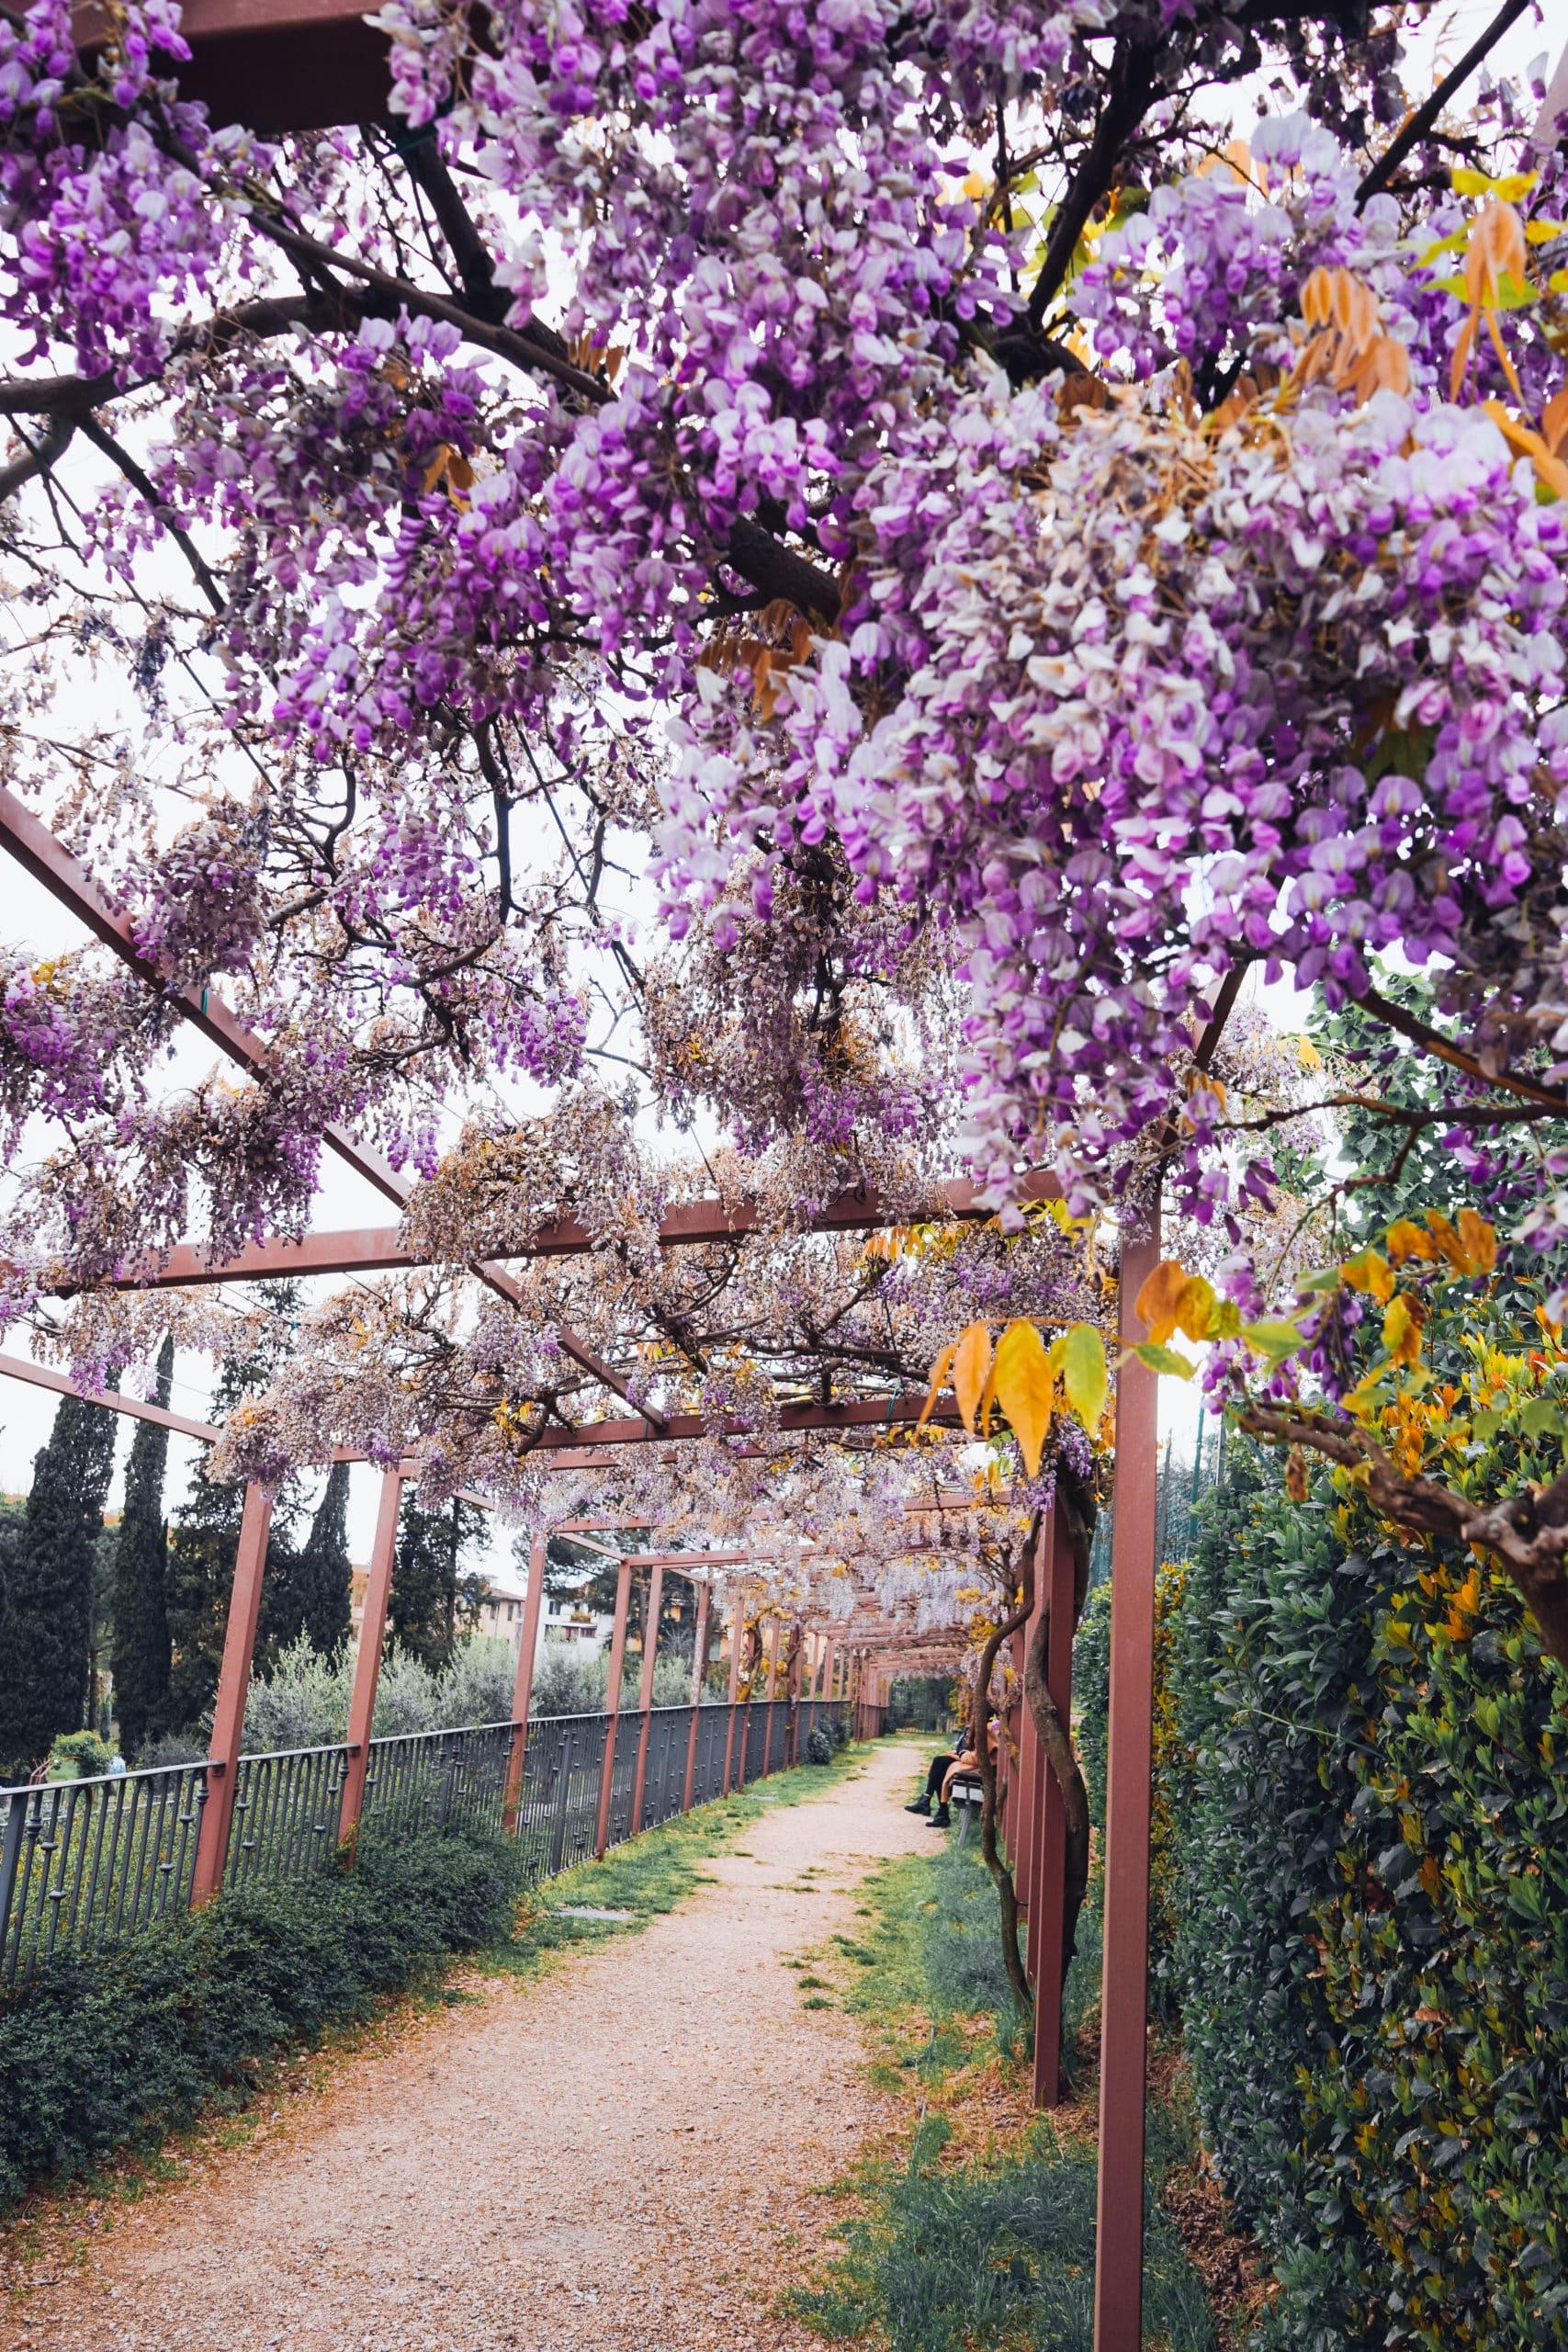 The Florentine parks